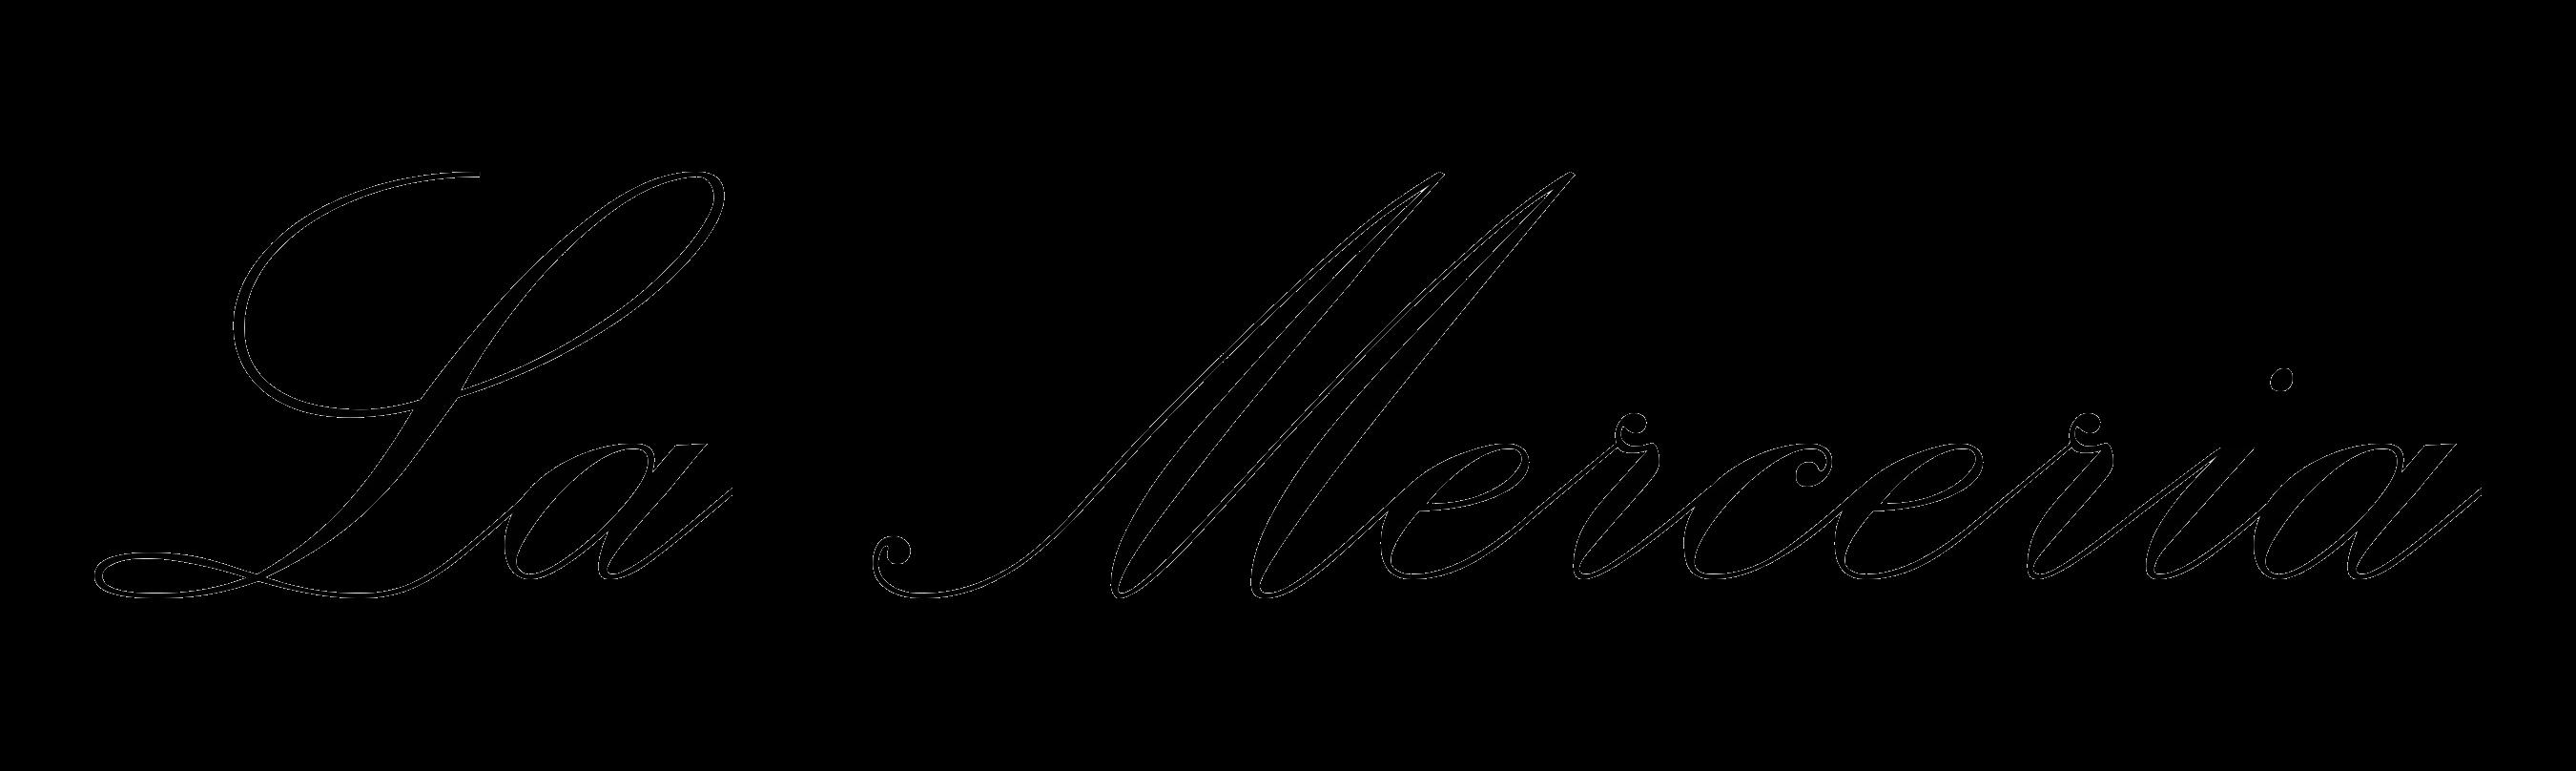 La Merceria Chiari